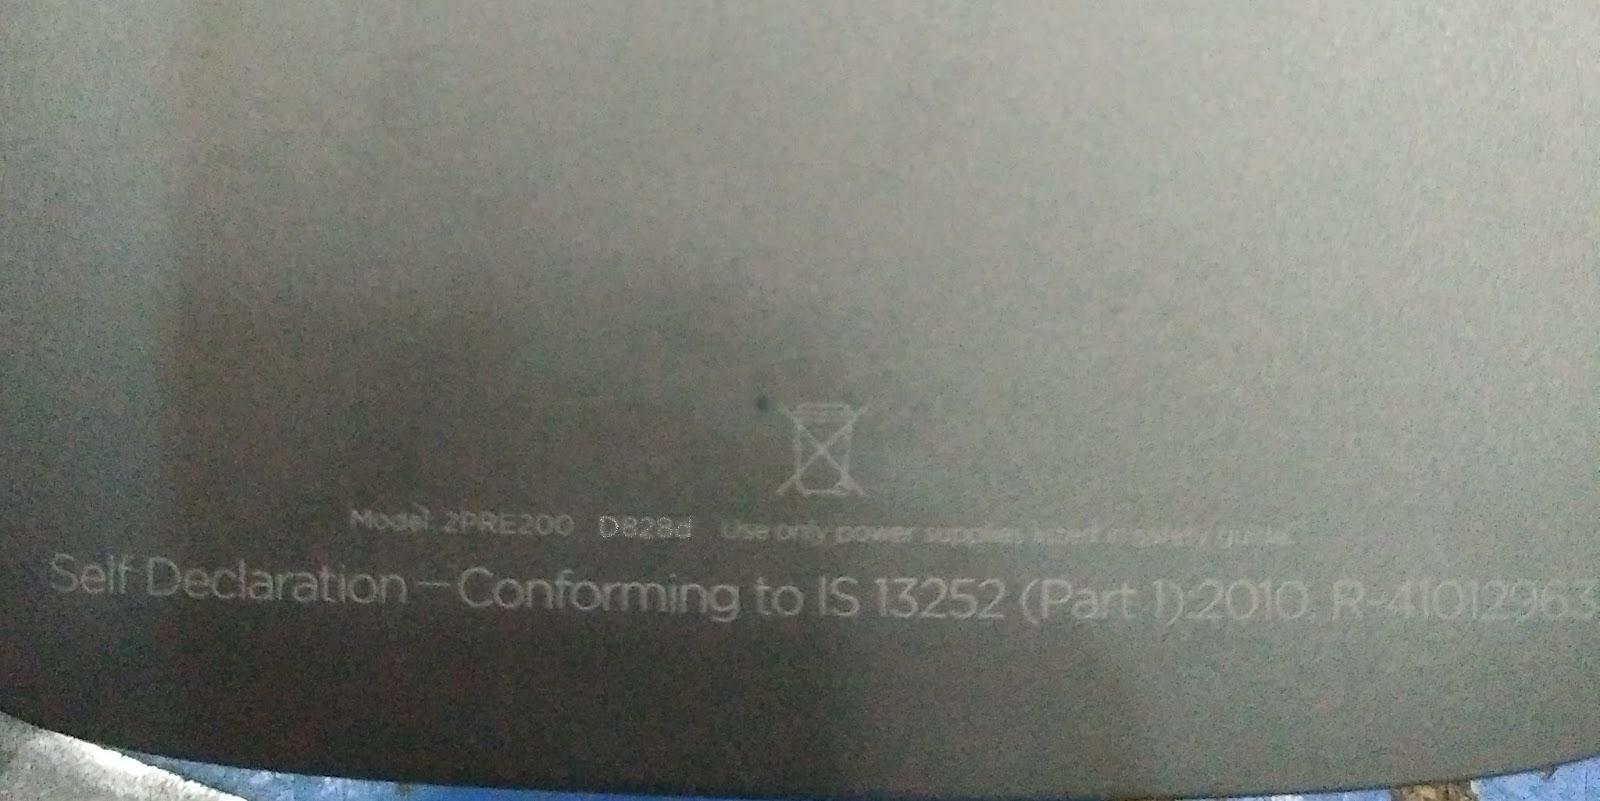 HTC DESIRE 828 DUAL SIM OR D828d FIRMWARE FLASH FILE MT6735